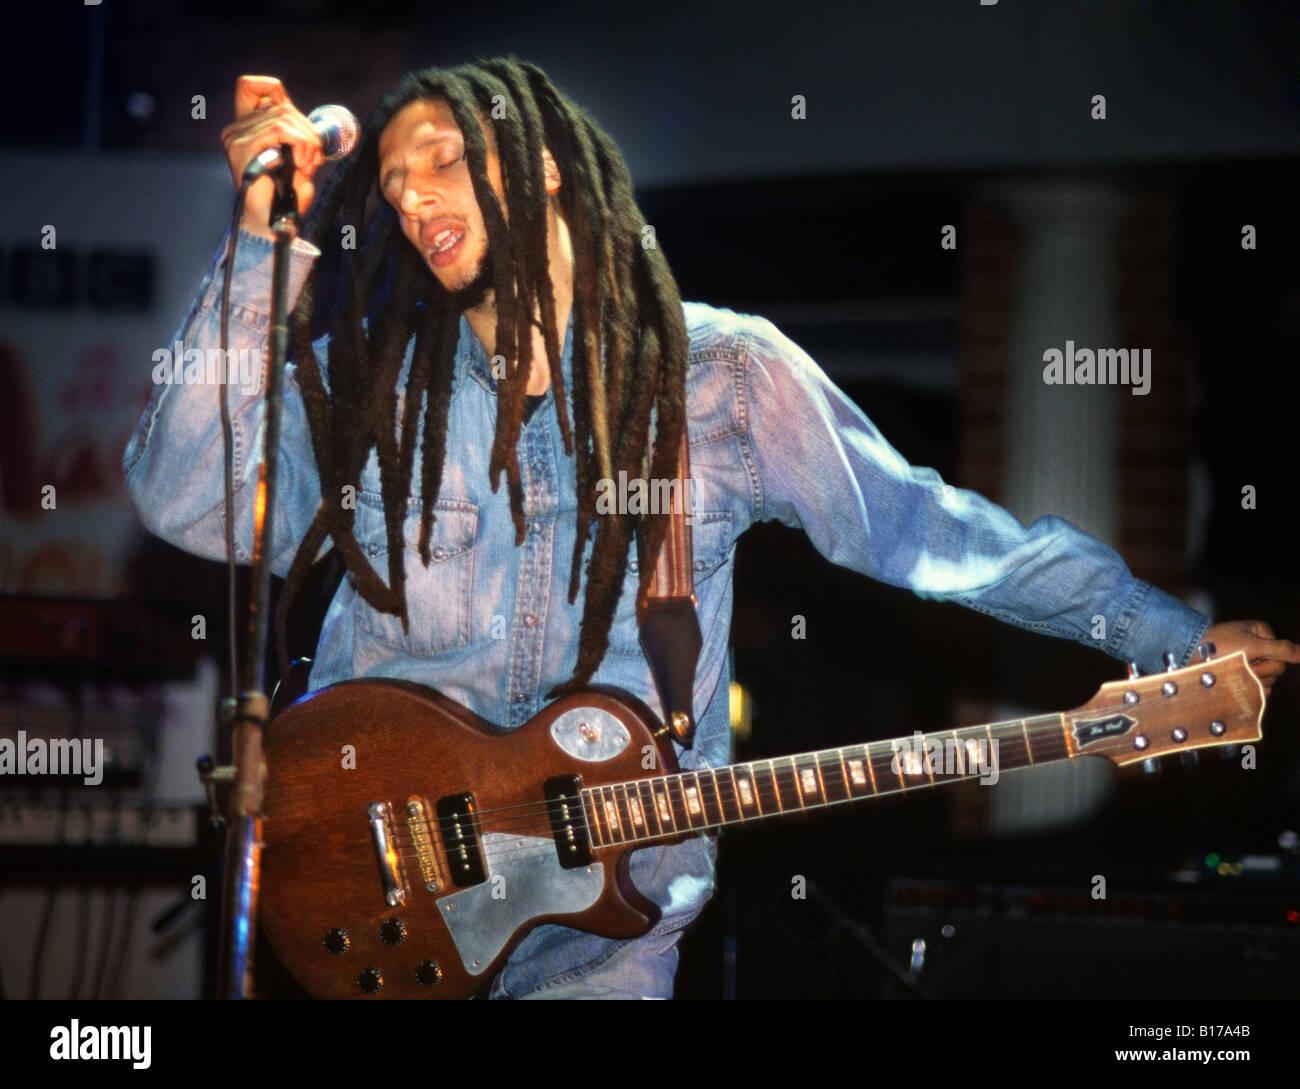 Julian Marley performs at The Buttermarket, Shrewsbury, Shropshire, England 2004 - Stock Image